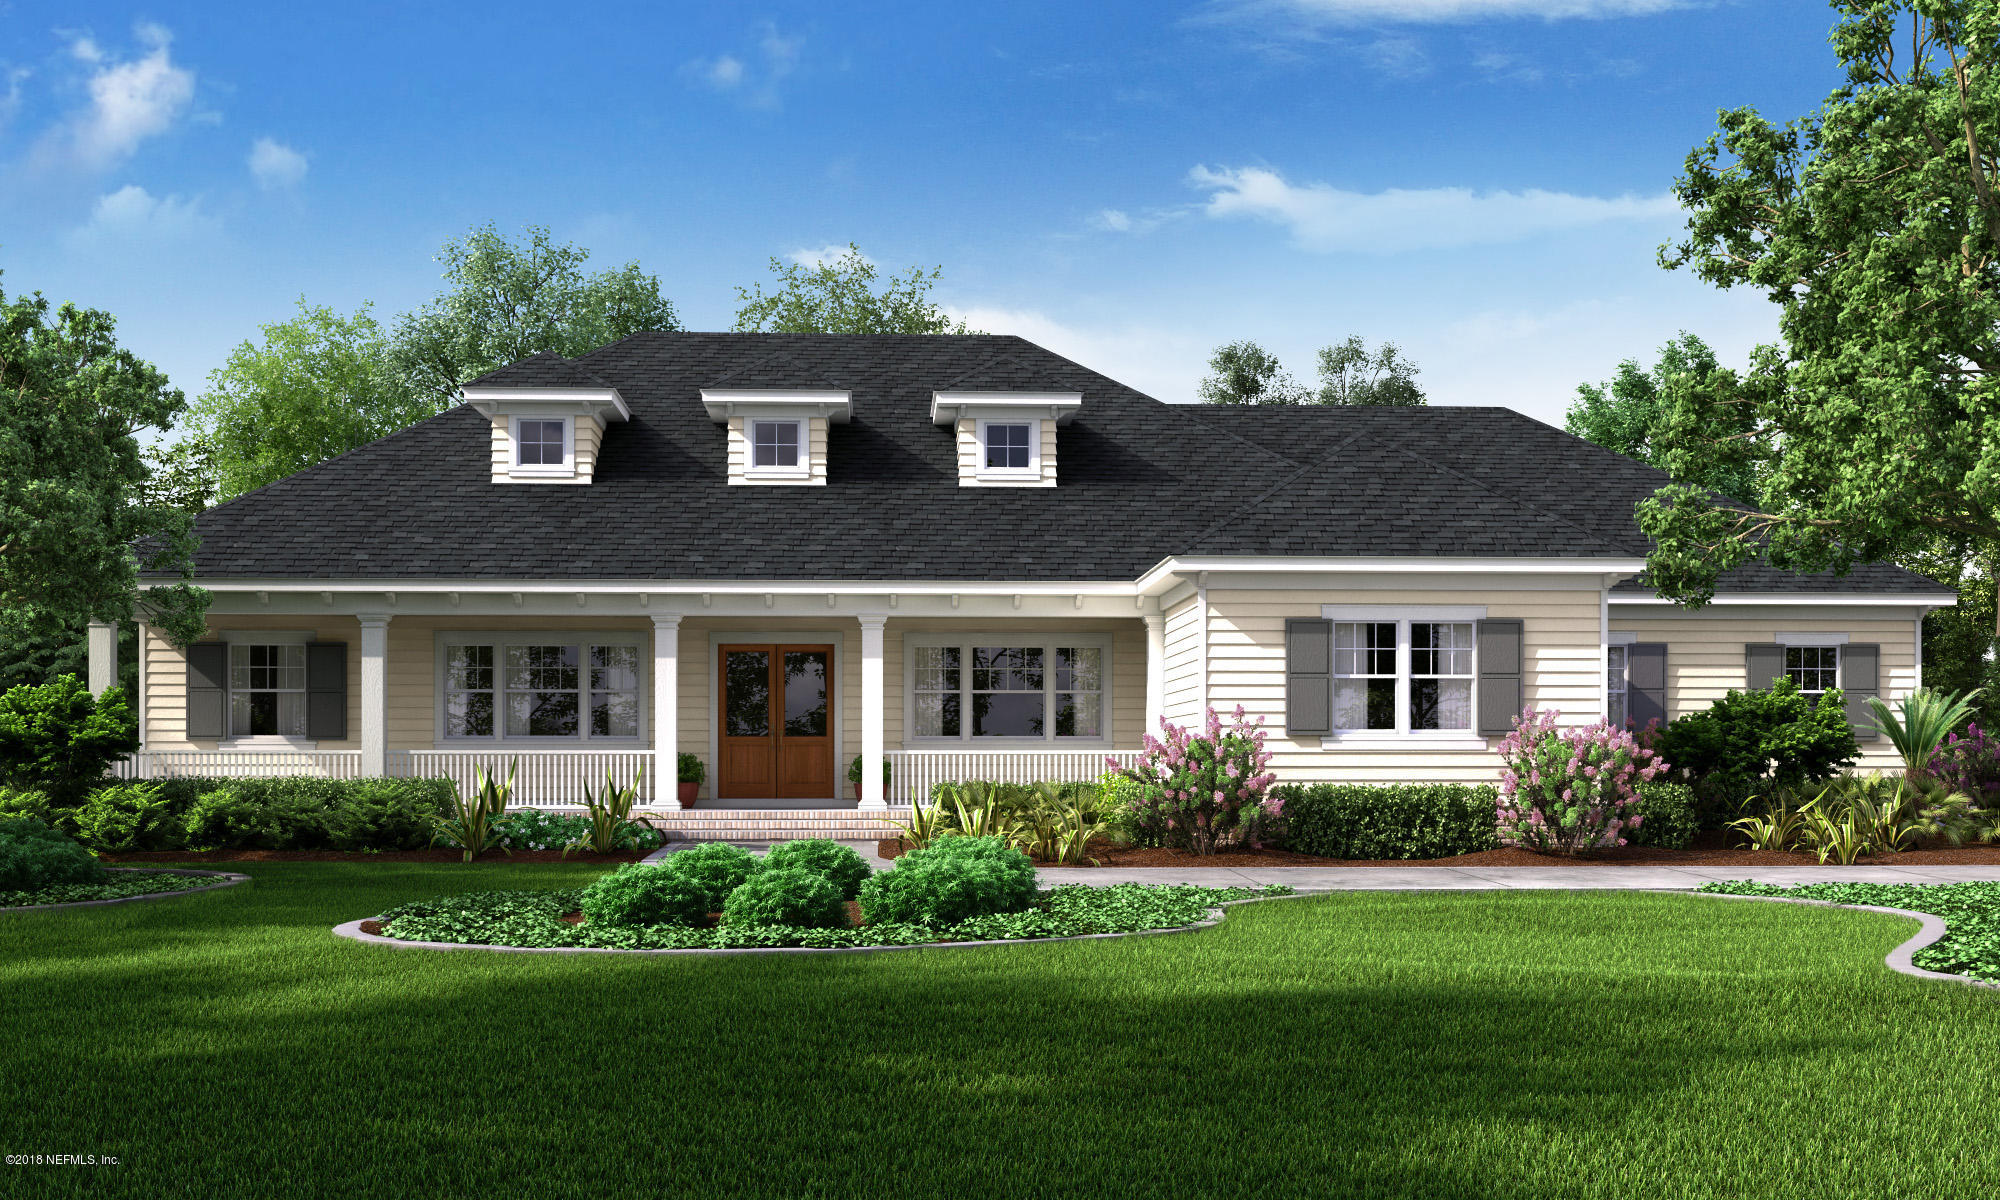 13849 ADMIRALS BEND, JACKSONVILLE, FLORIDA 32225, 4 Bedrooms Bedrooms, ,4 BathroomsBathrooms,Residential - single family,For sale,ADMIRALS BEND,968241